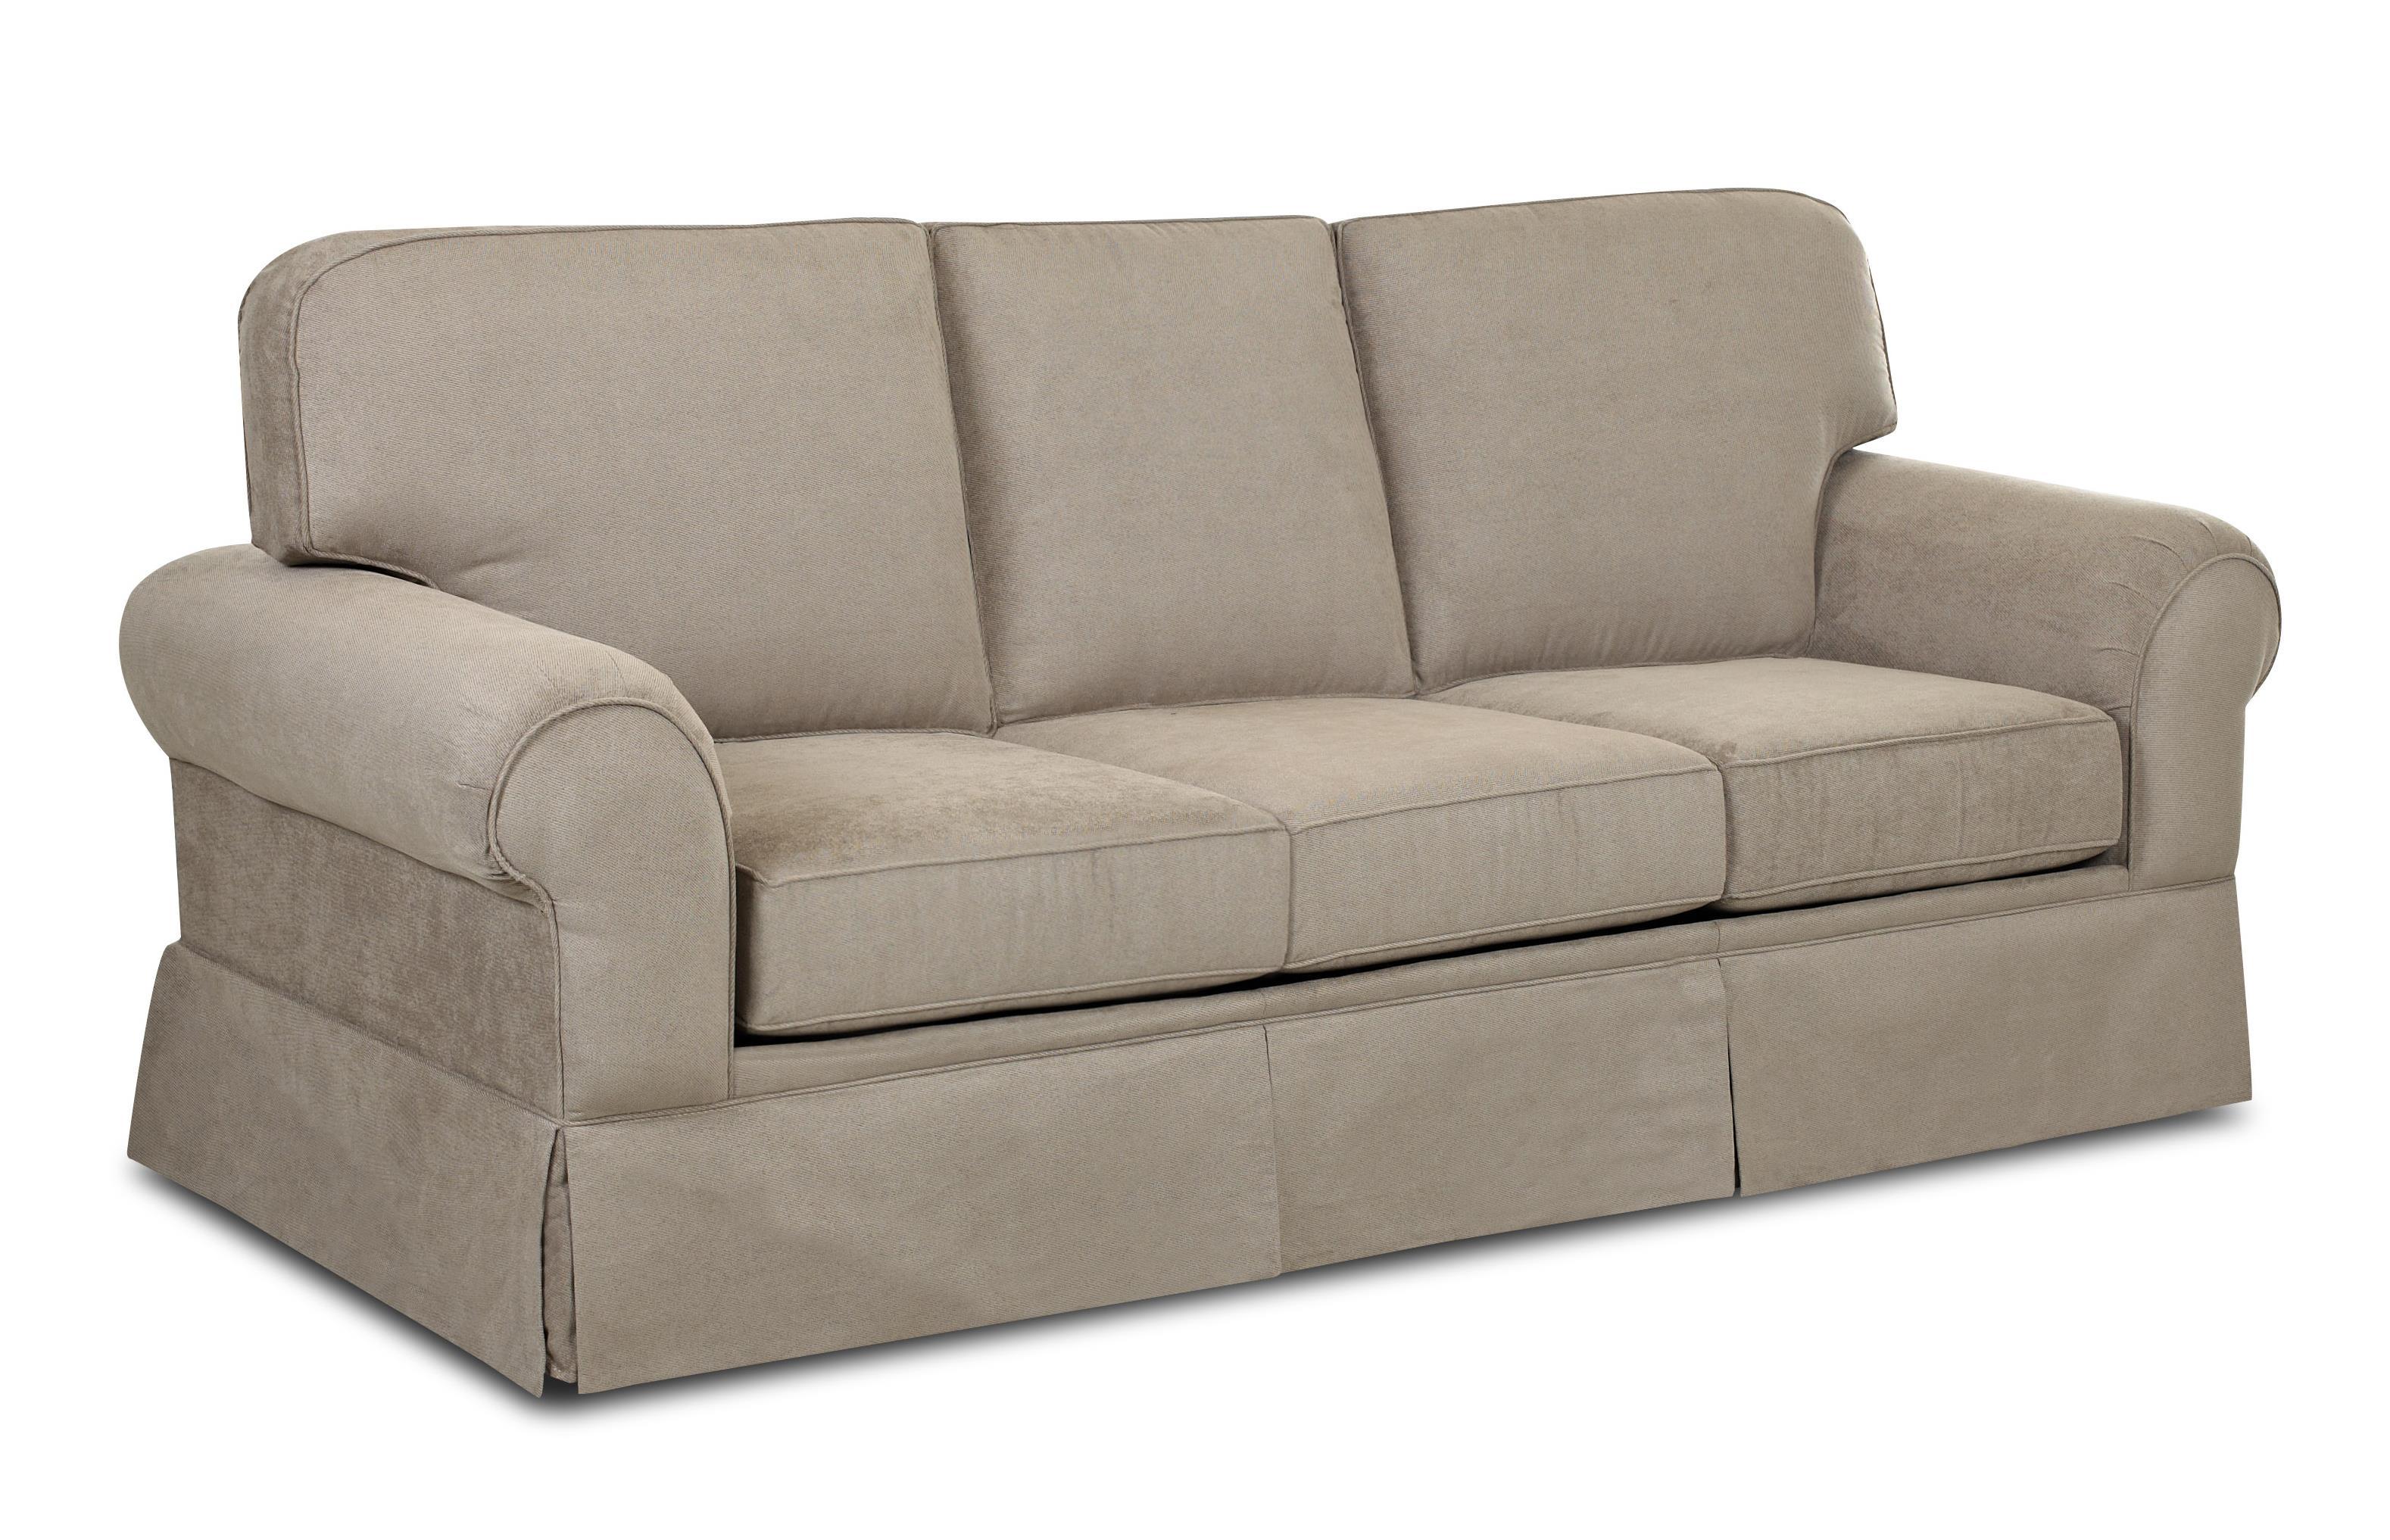 klaussner sofa and loveseat set modern design woodwin innerspring queen sleeper johnny